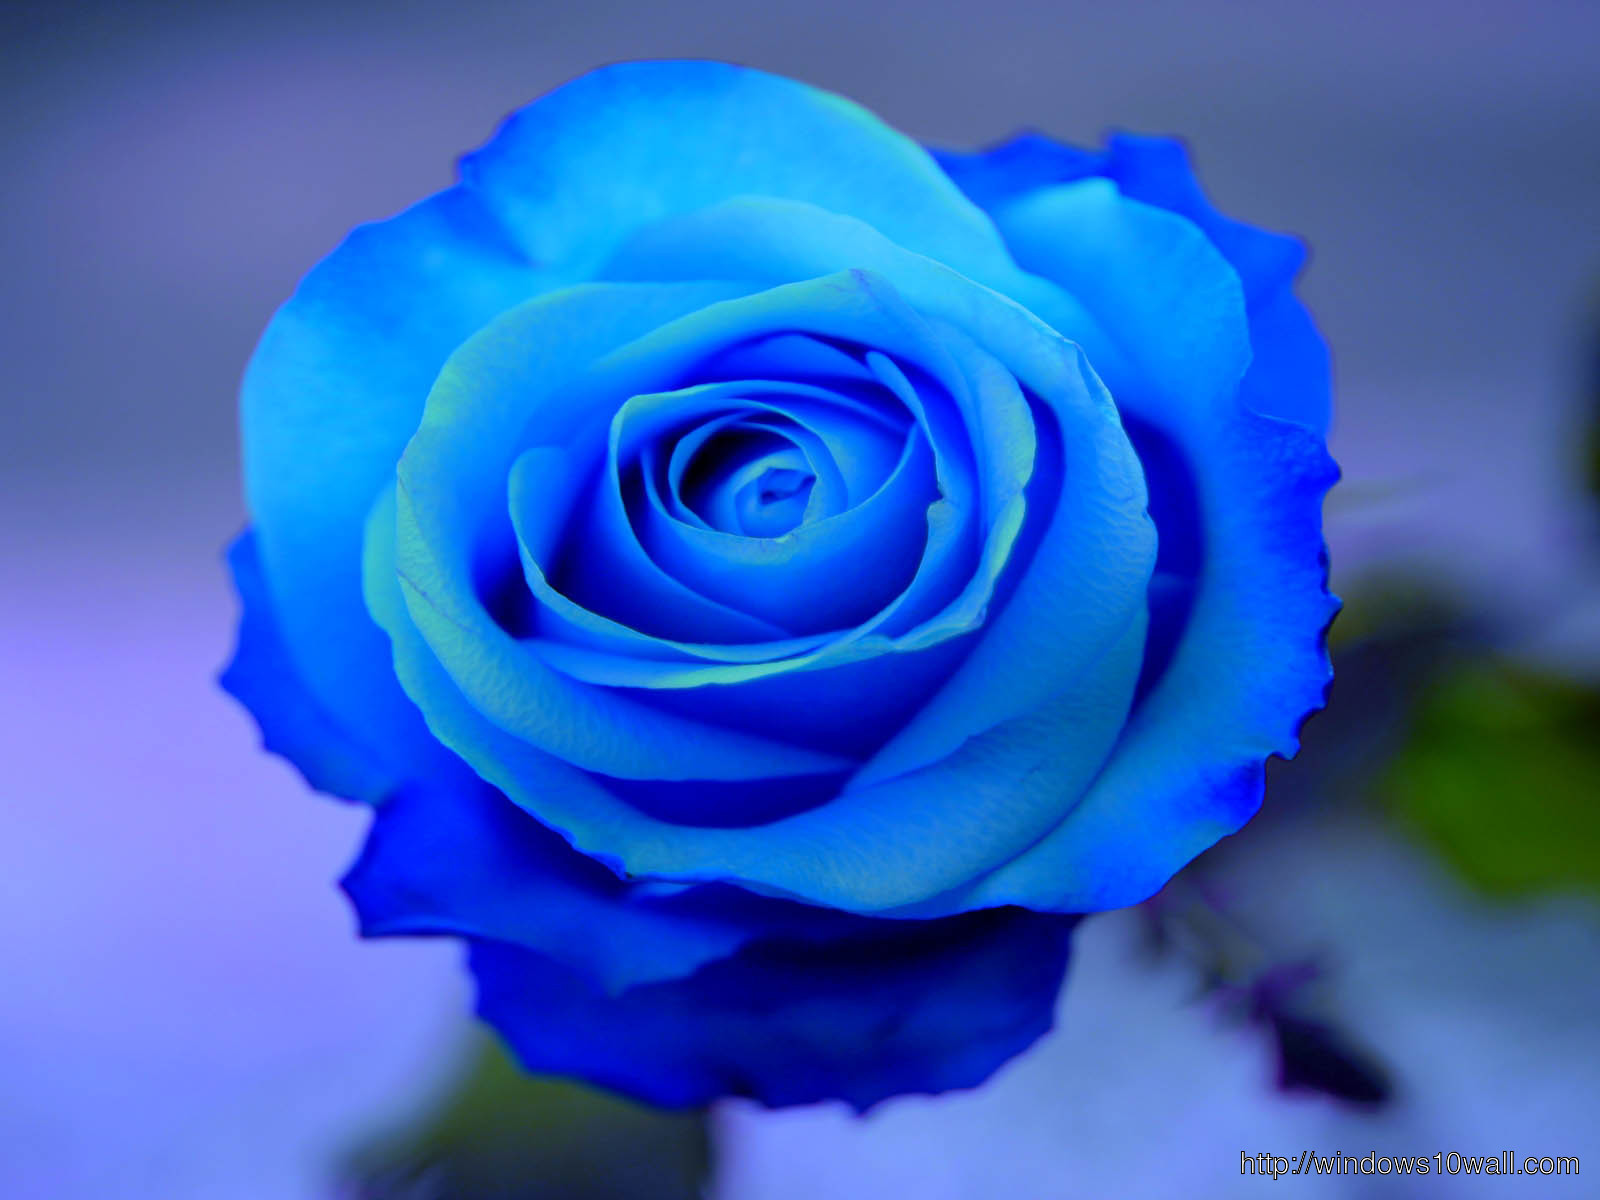 Blue rose hd wallpaper windows 10 wallpapers - Blue rose hd wallpaper download ...